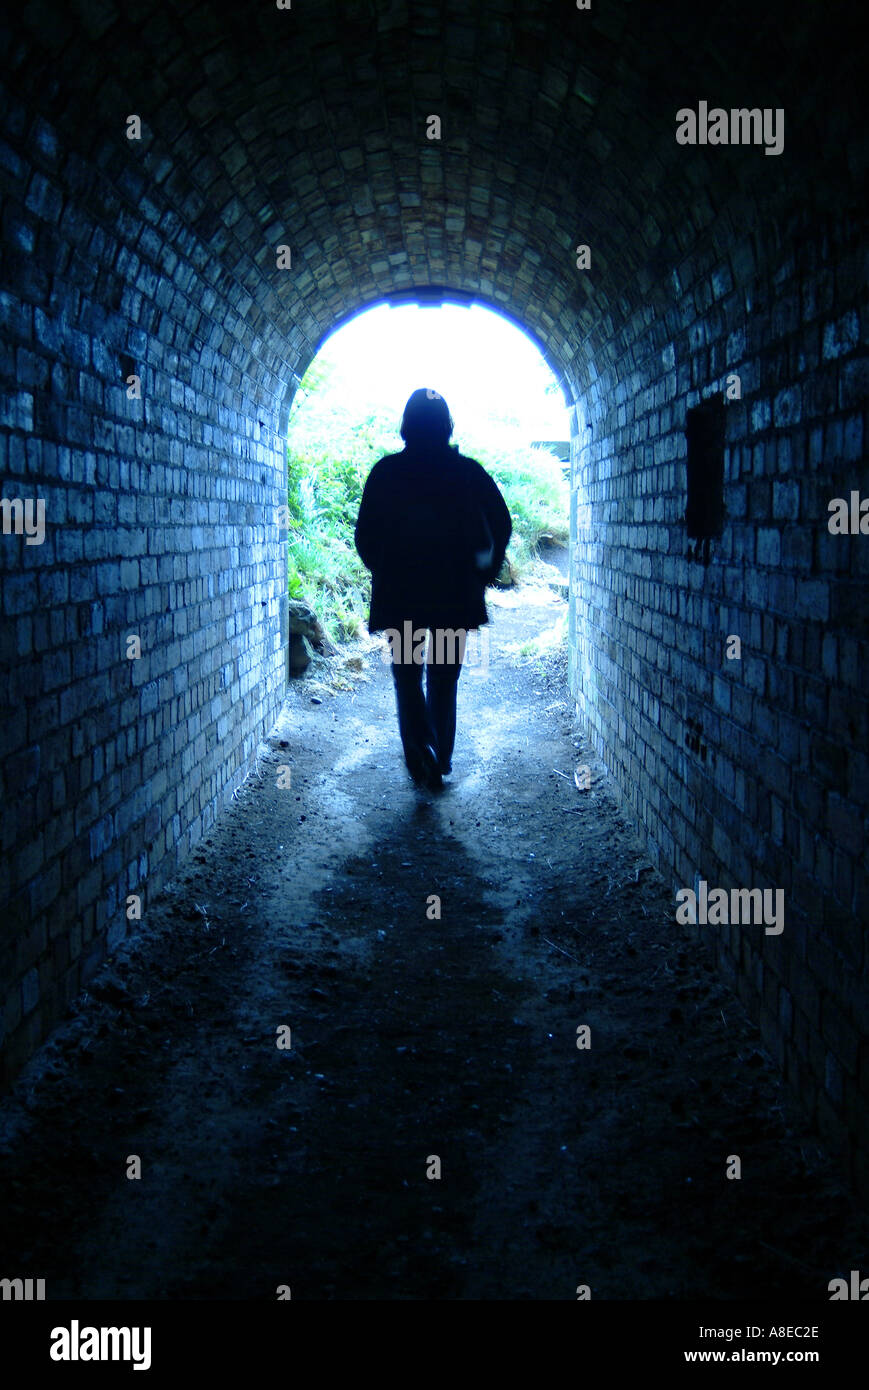 celestial alley